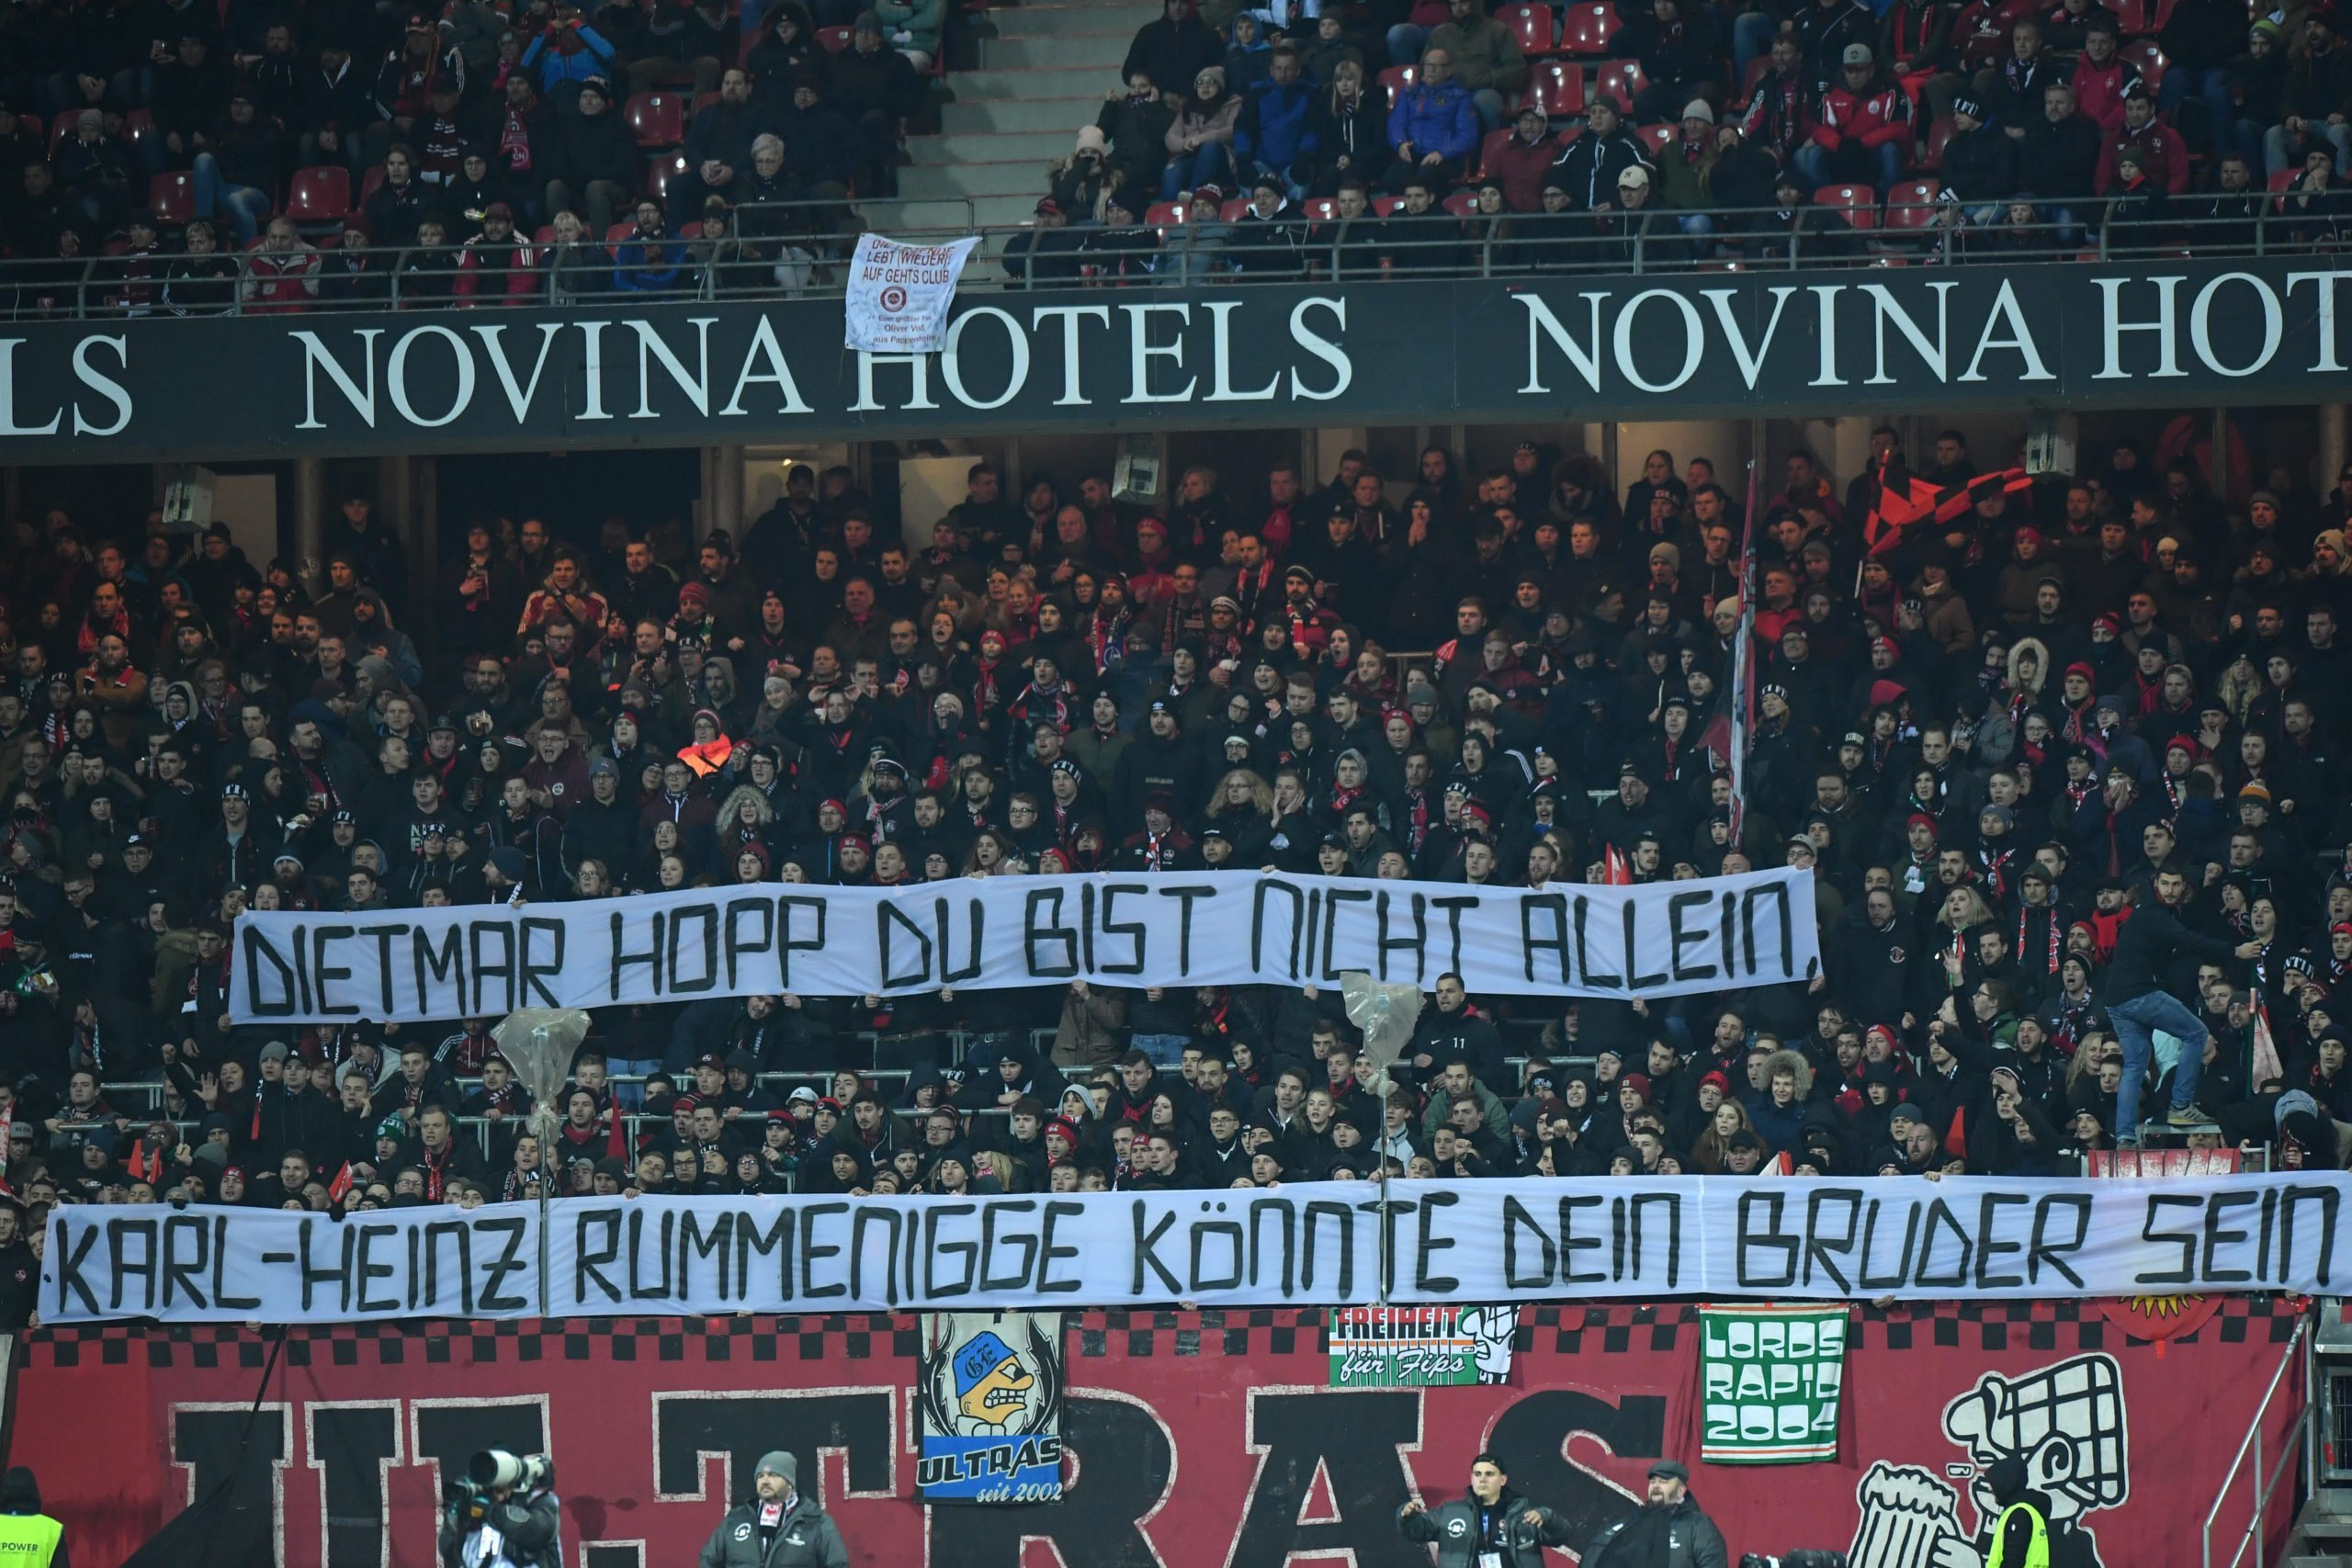 Ultras vs Rummenigge